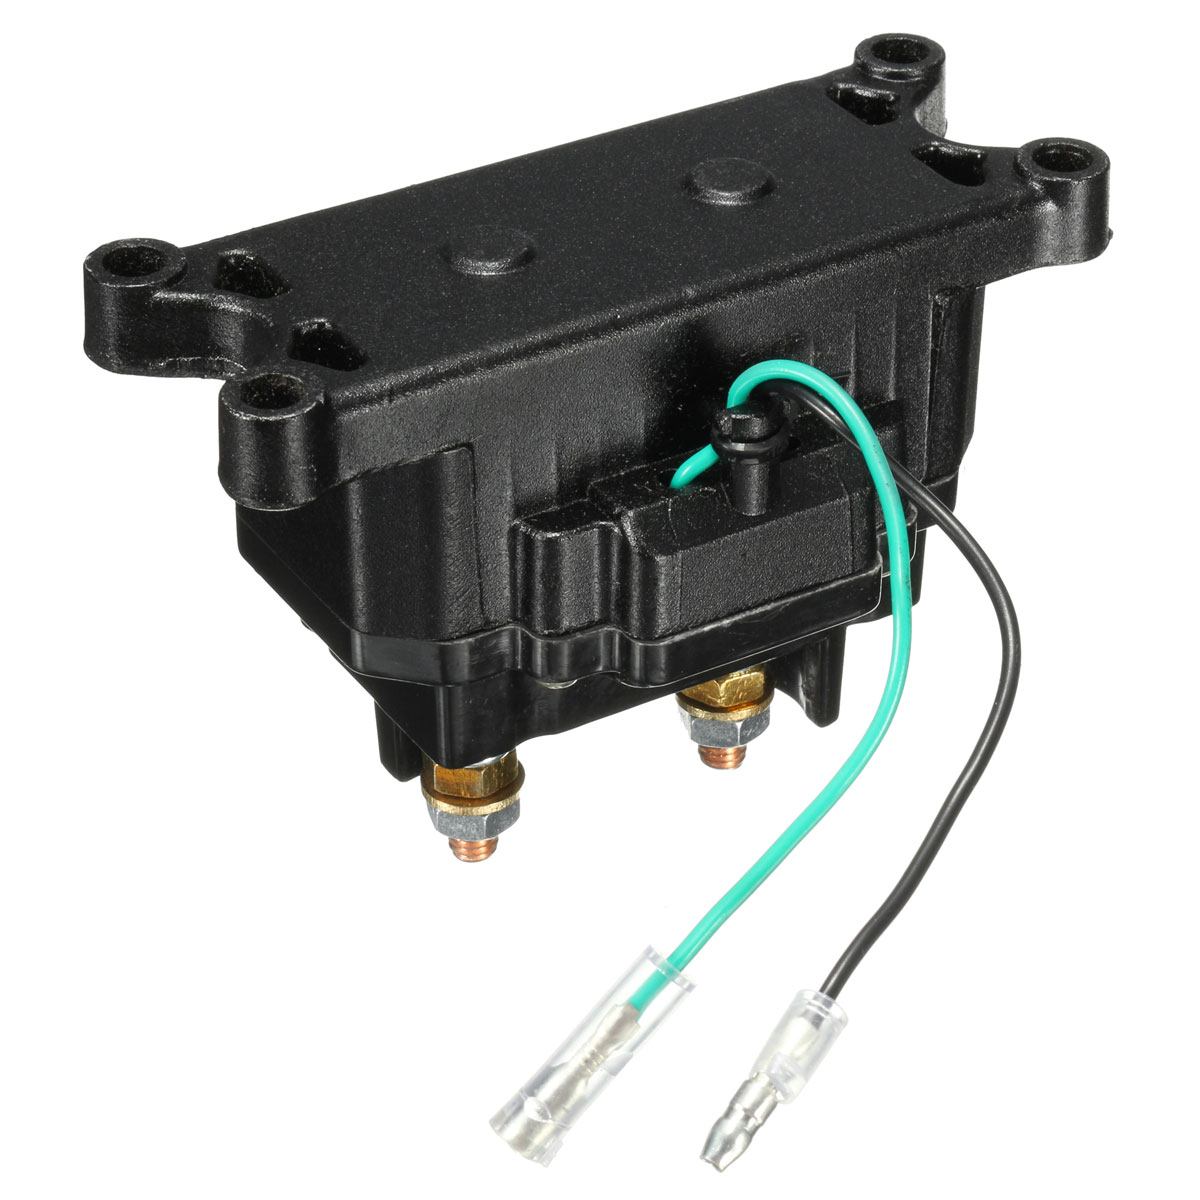 hight resolution of 12v 250a atv utv solenoid relay contactor winch rocker thumb switch wiring combo walmart com